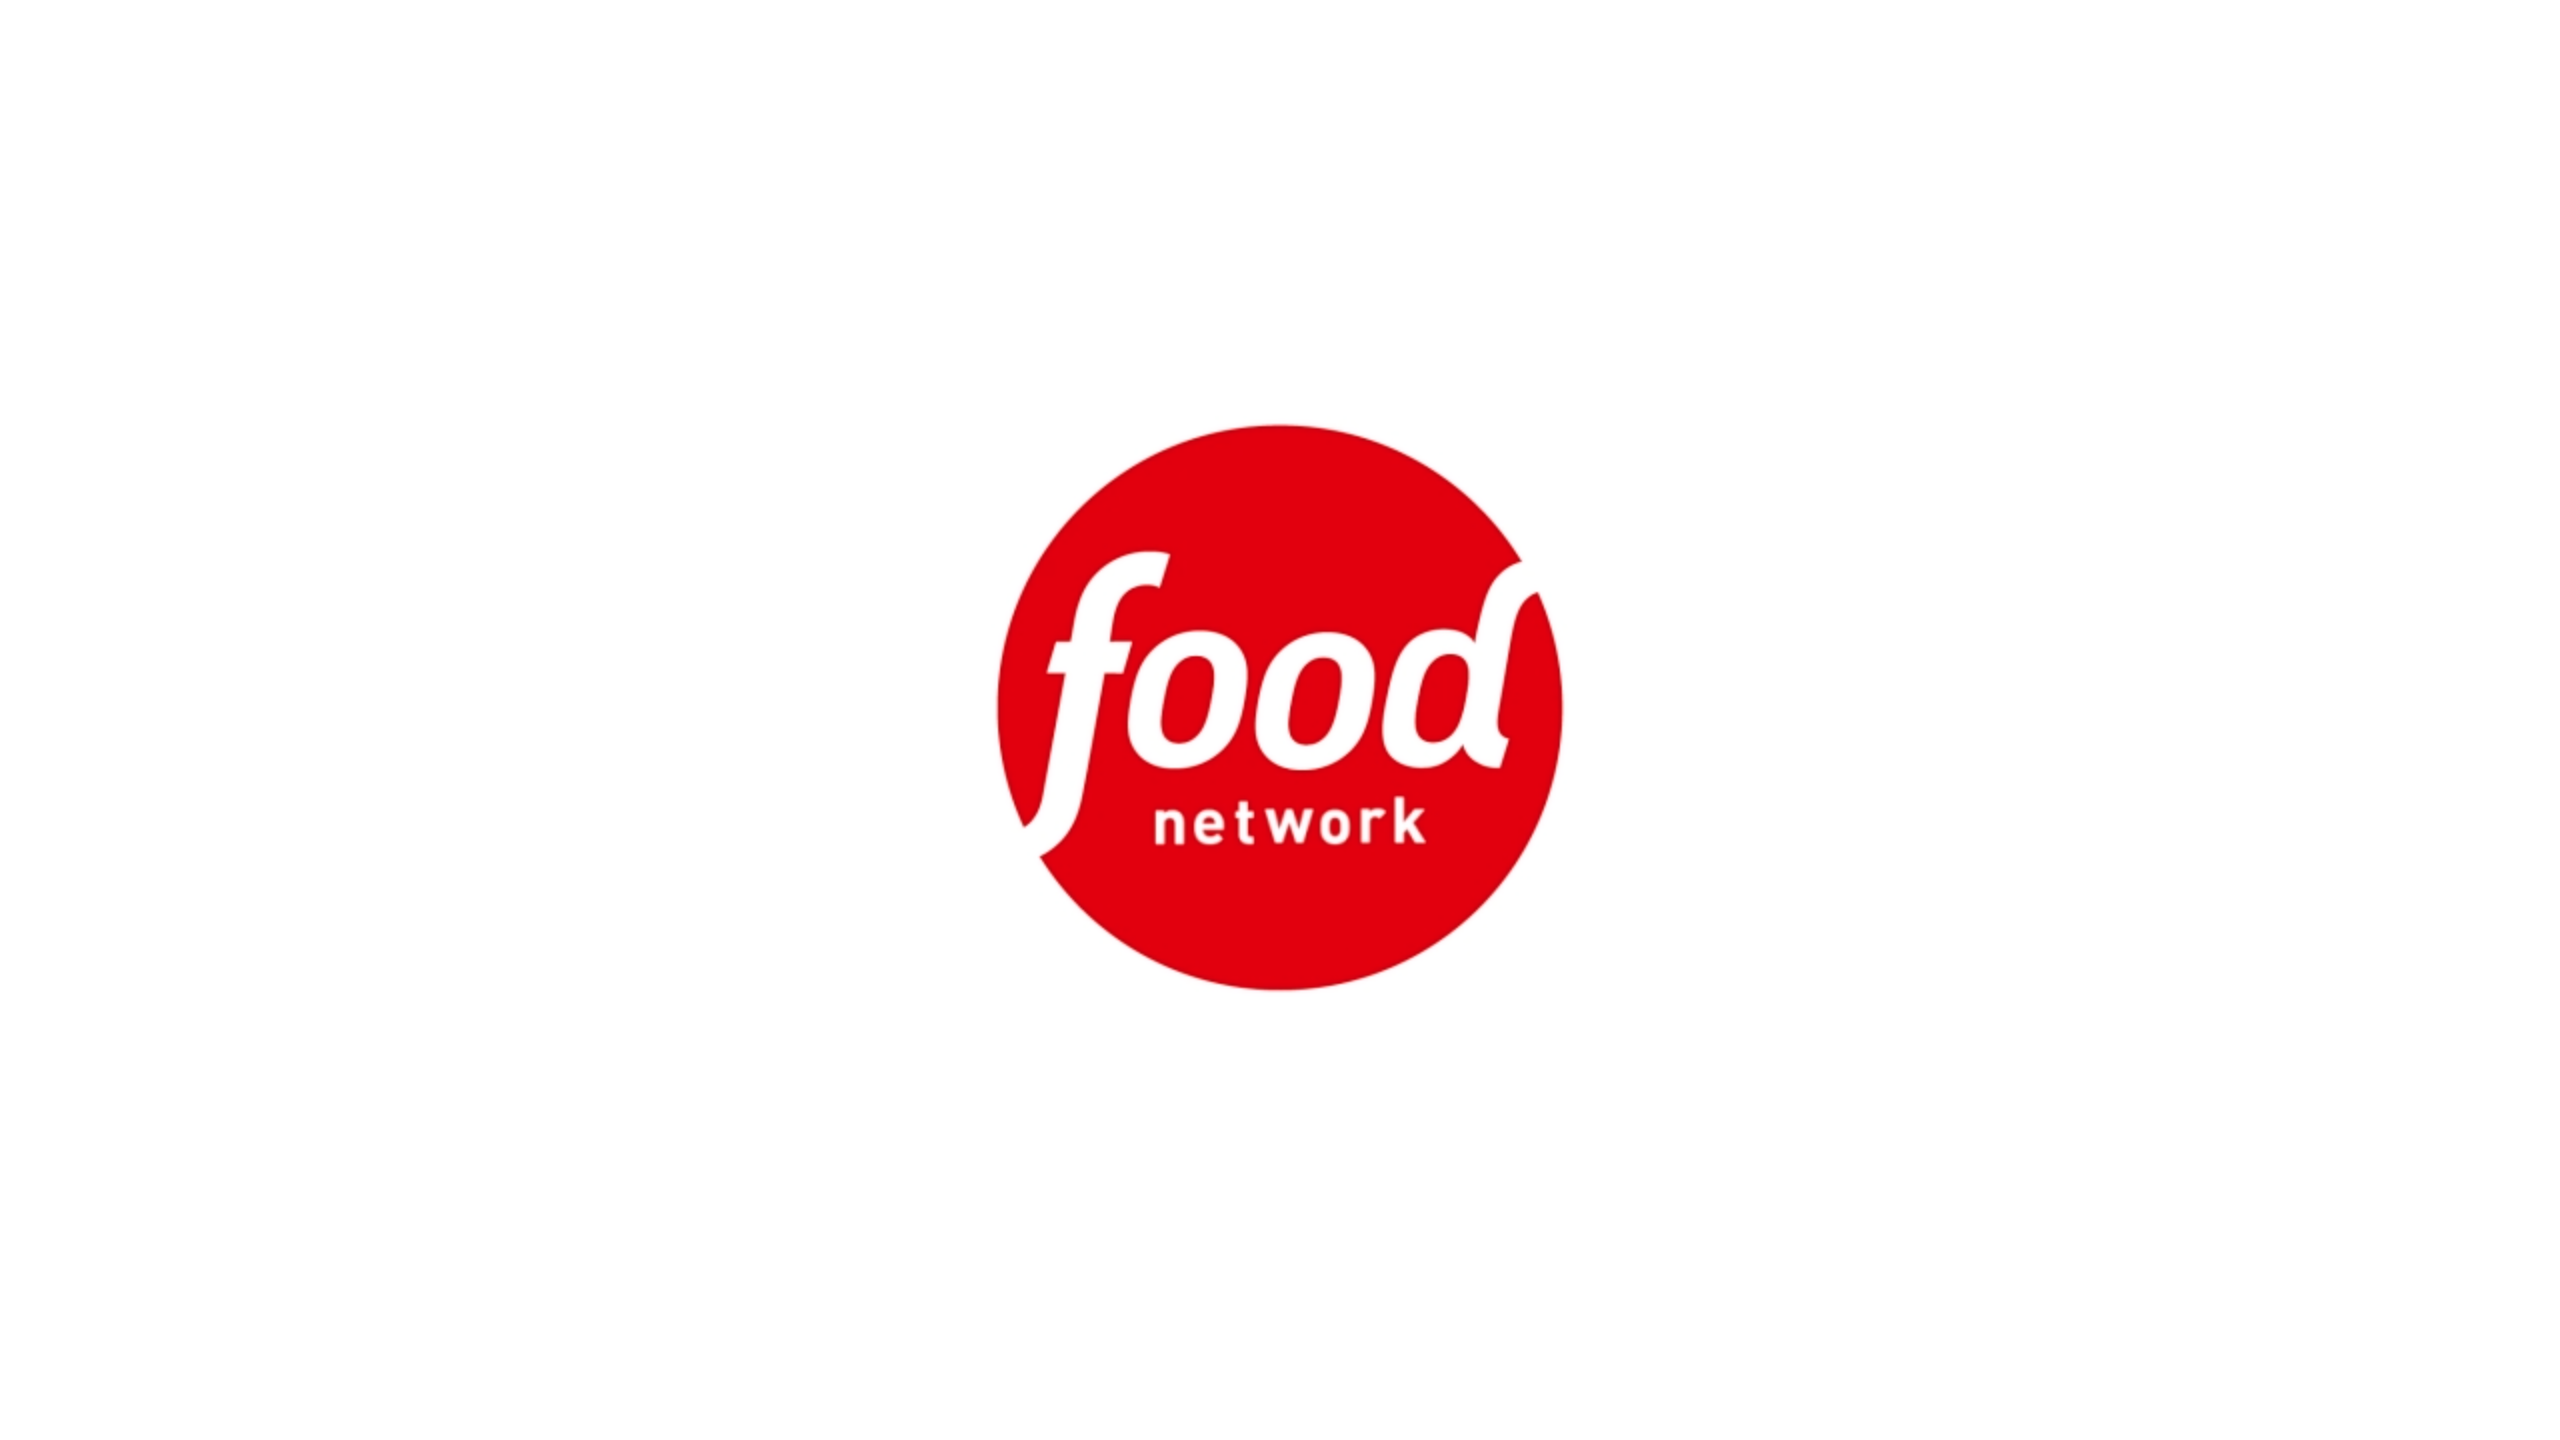 Food Network Logos